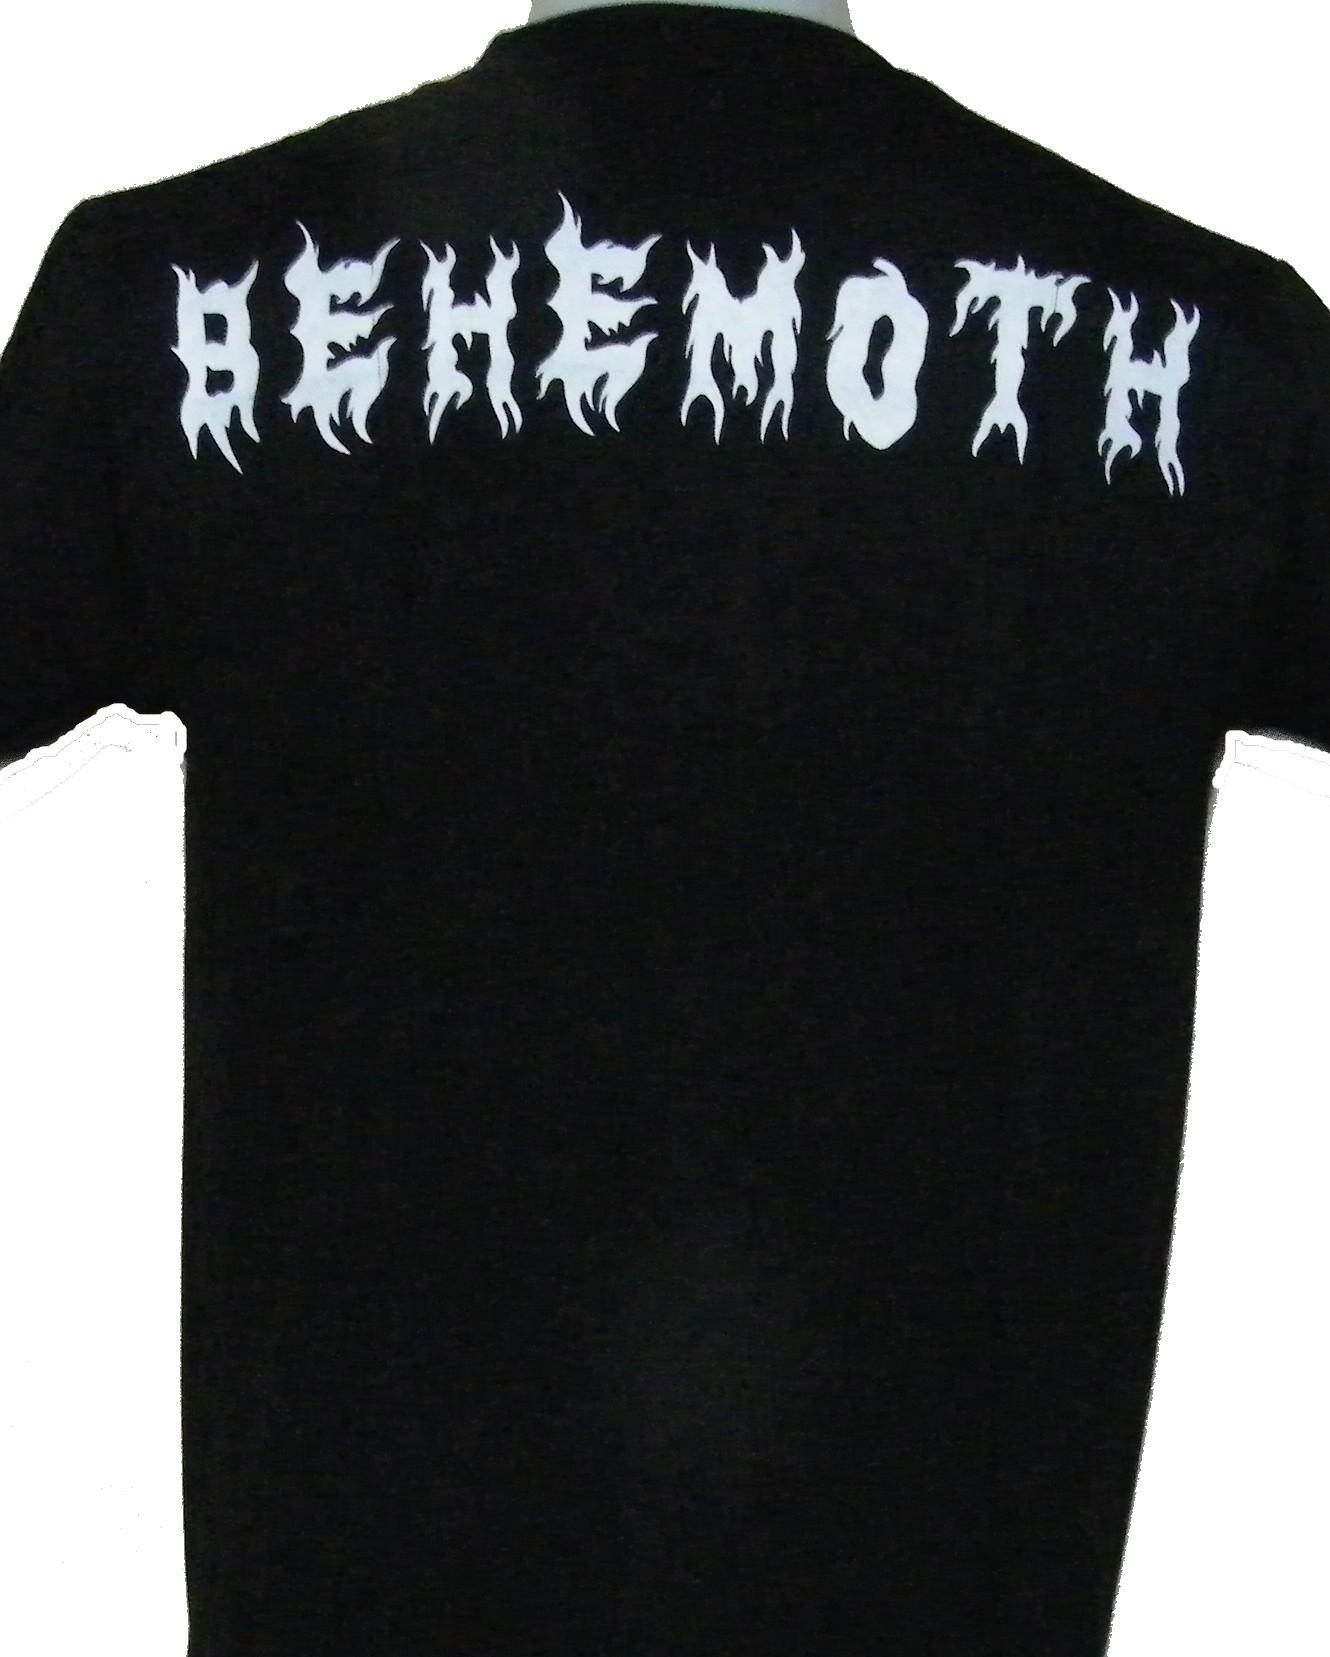 4bb498cea Behemoth t-shirt size L – RoxxBKK